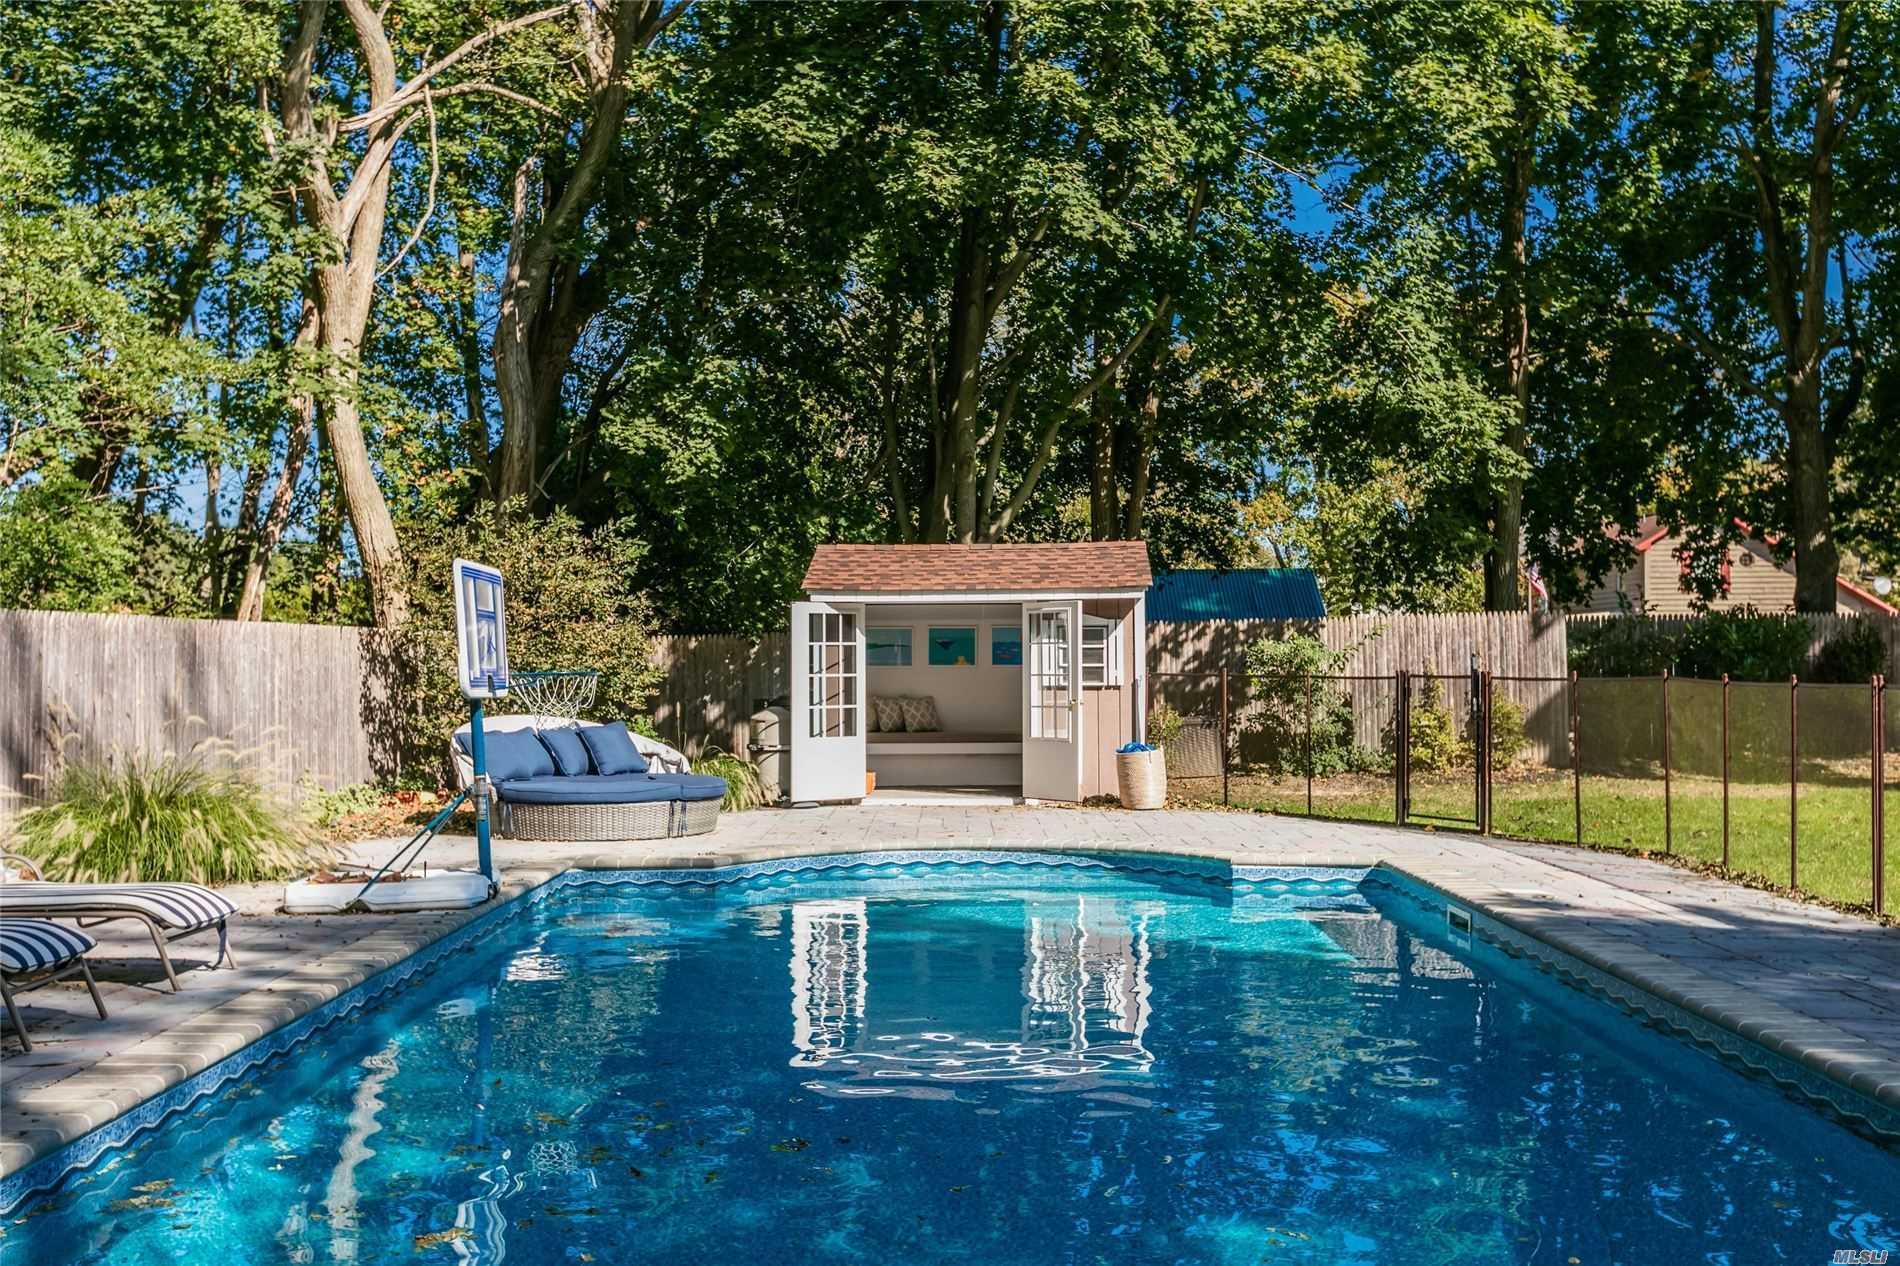 758 Peconic Bay Blvd - Jamesport, New York